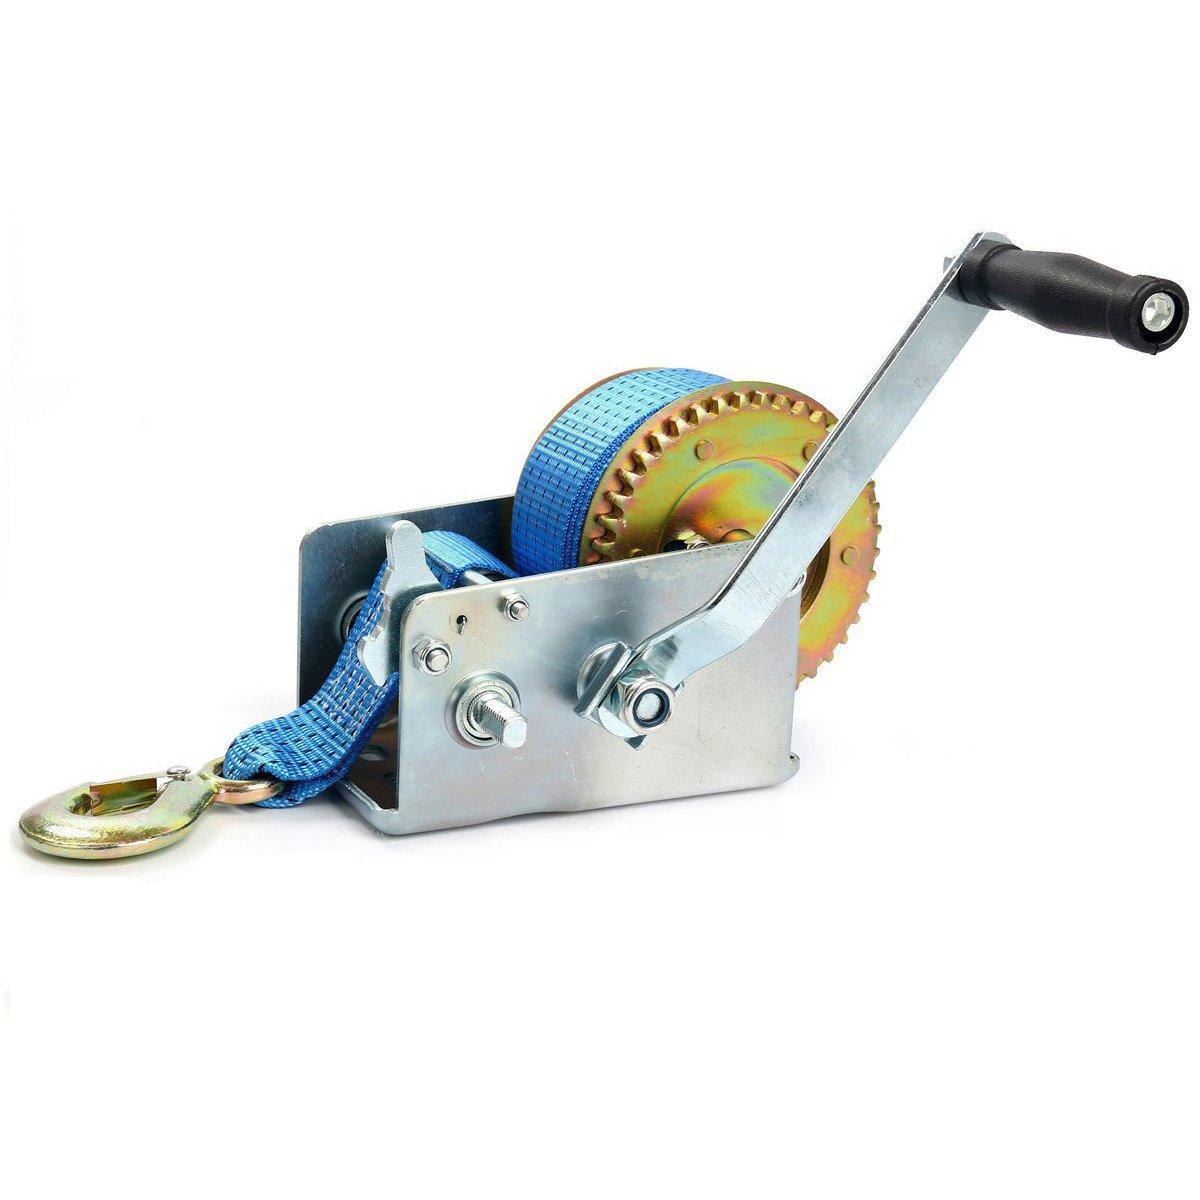 8MILELAKE Hand Crank Strap Gear Winch 2500lbs Hand Winch Polyester Strap ATV Boat Trailer Heavy Duty